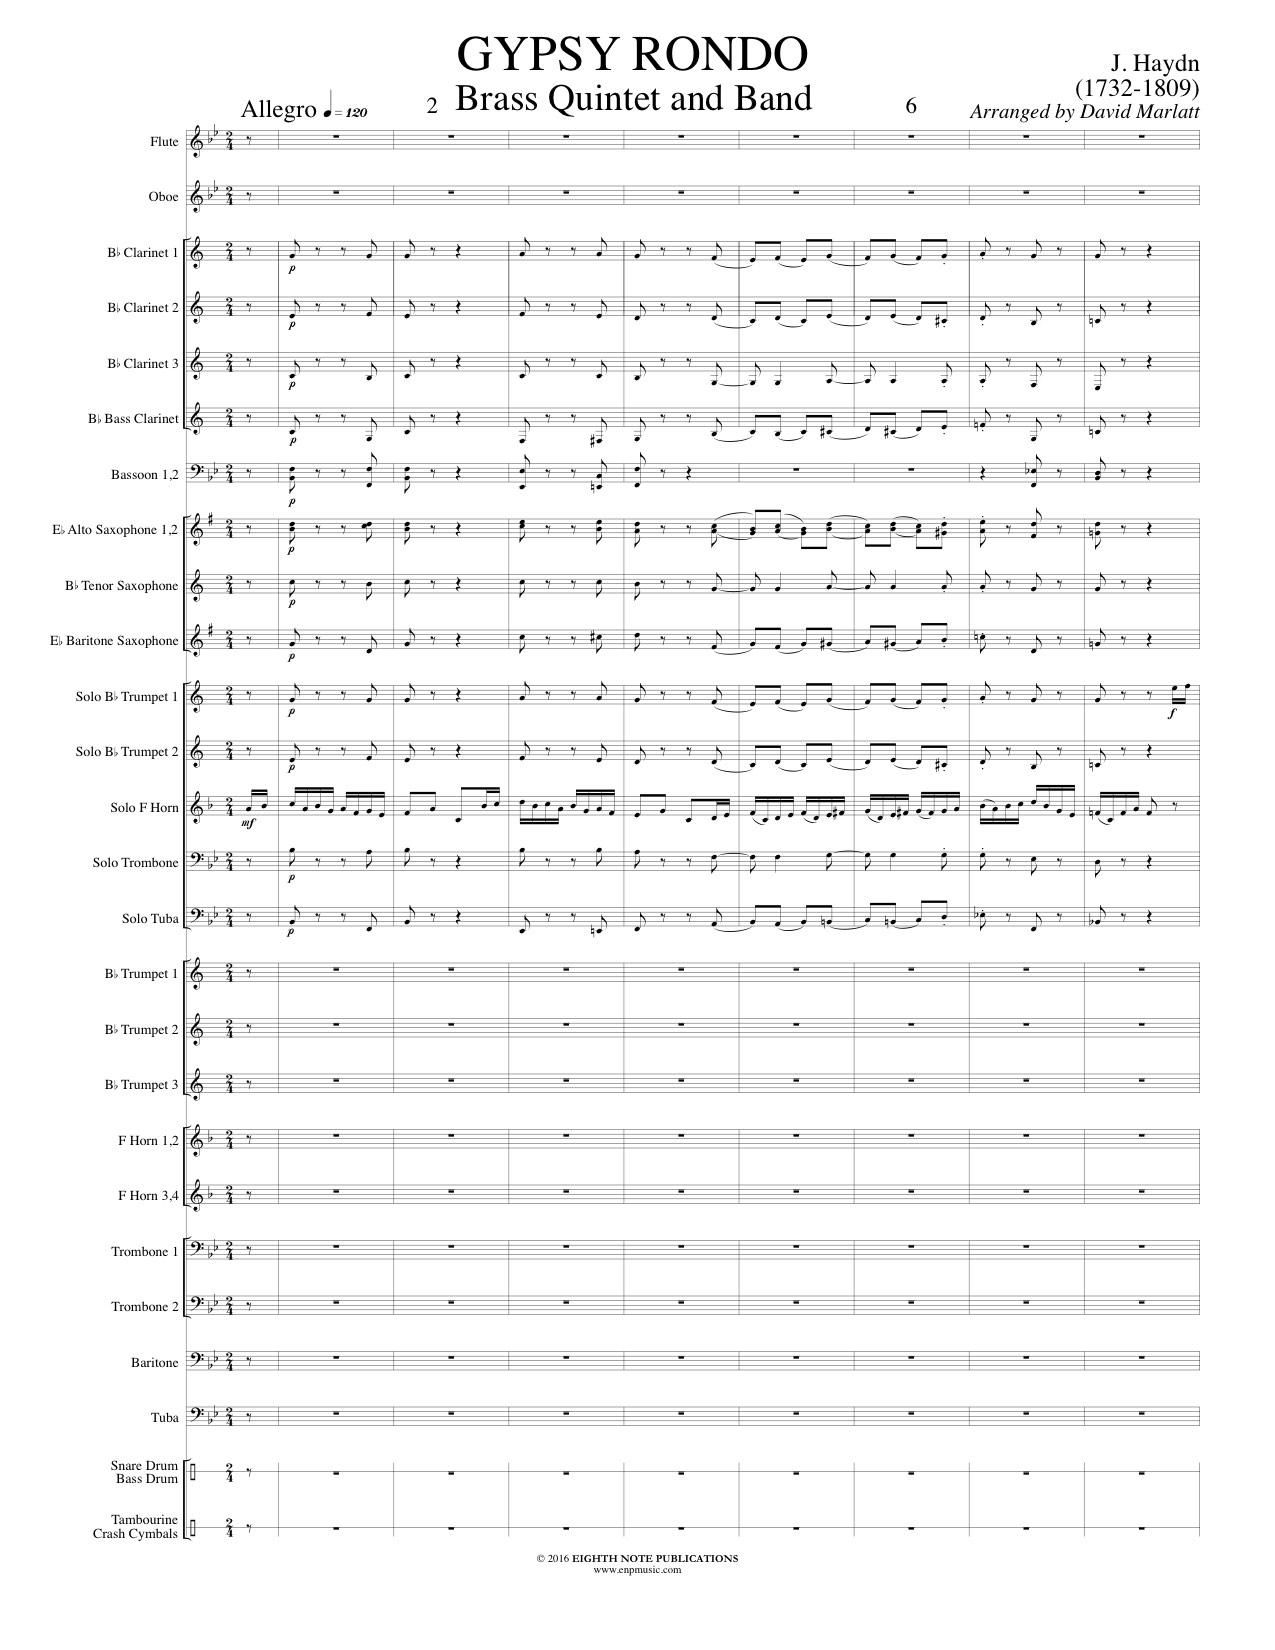 Gypsy Rondo - Brass Quintet and Band - Franz Joseph Haydn